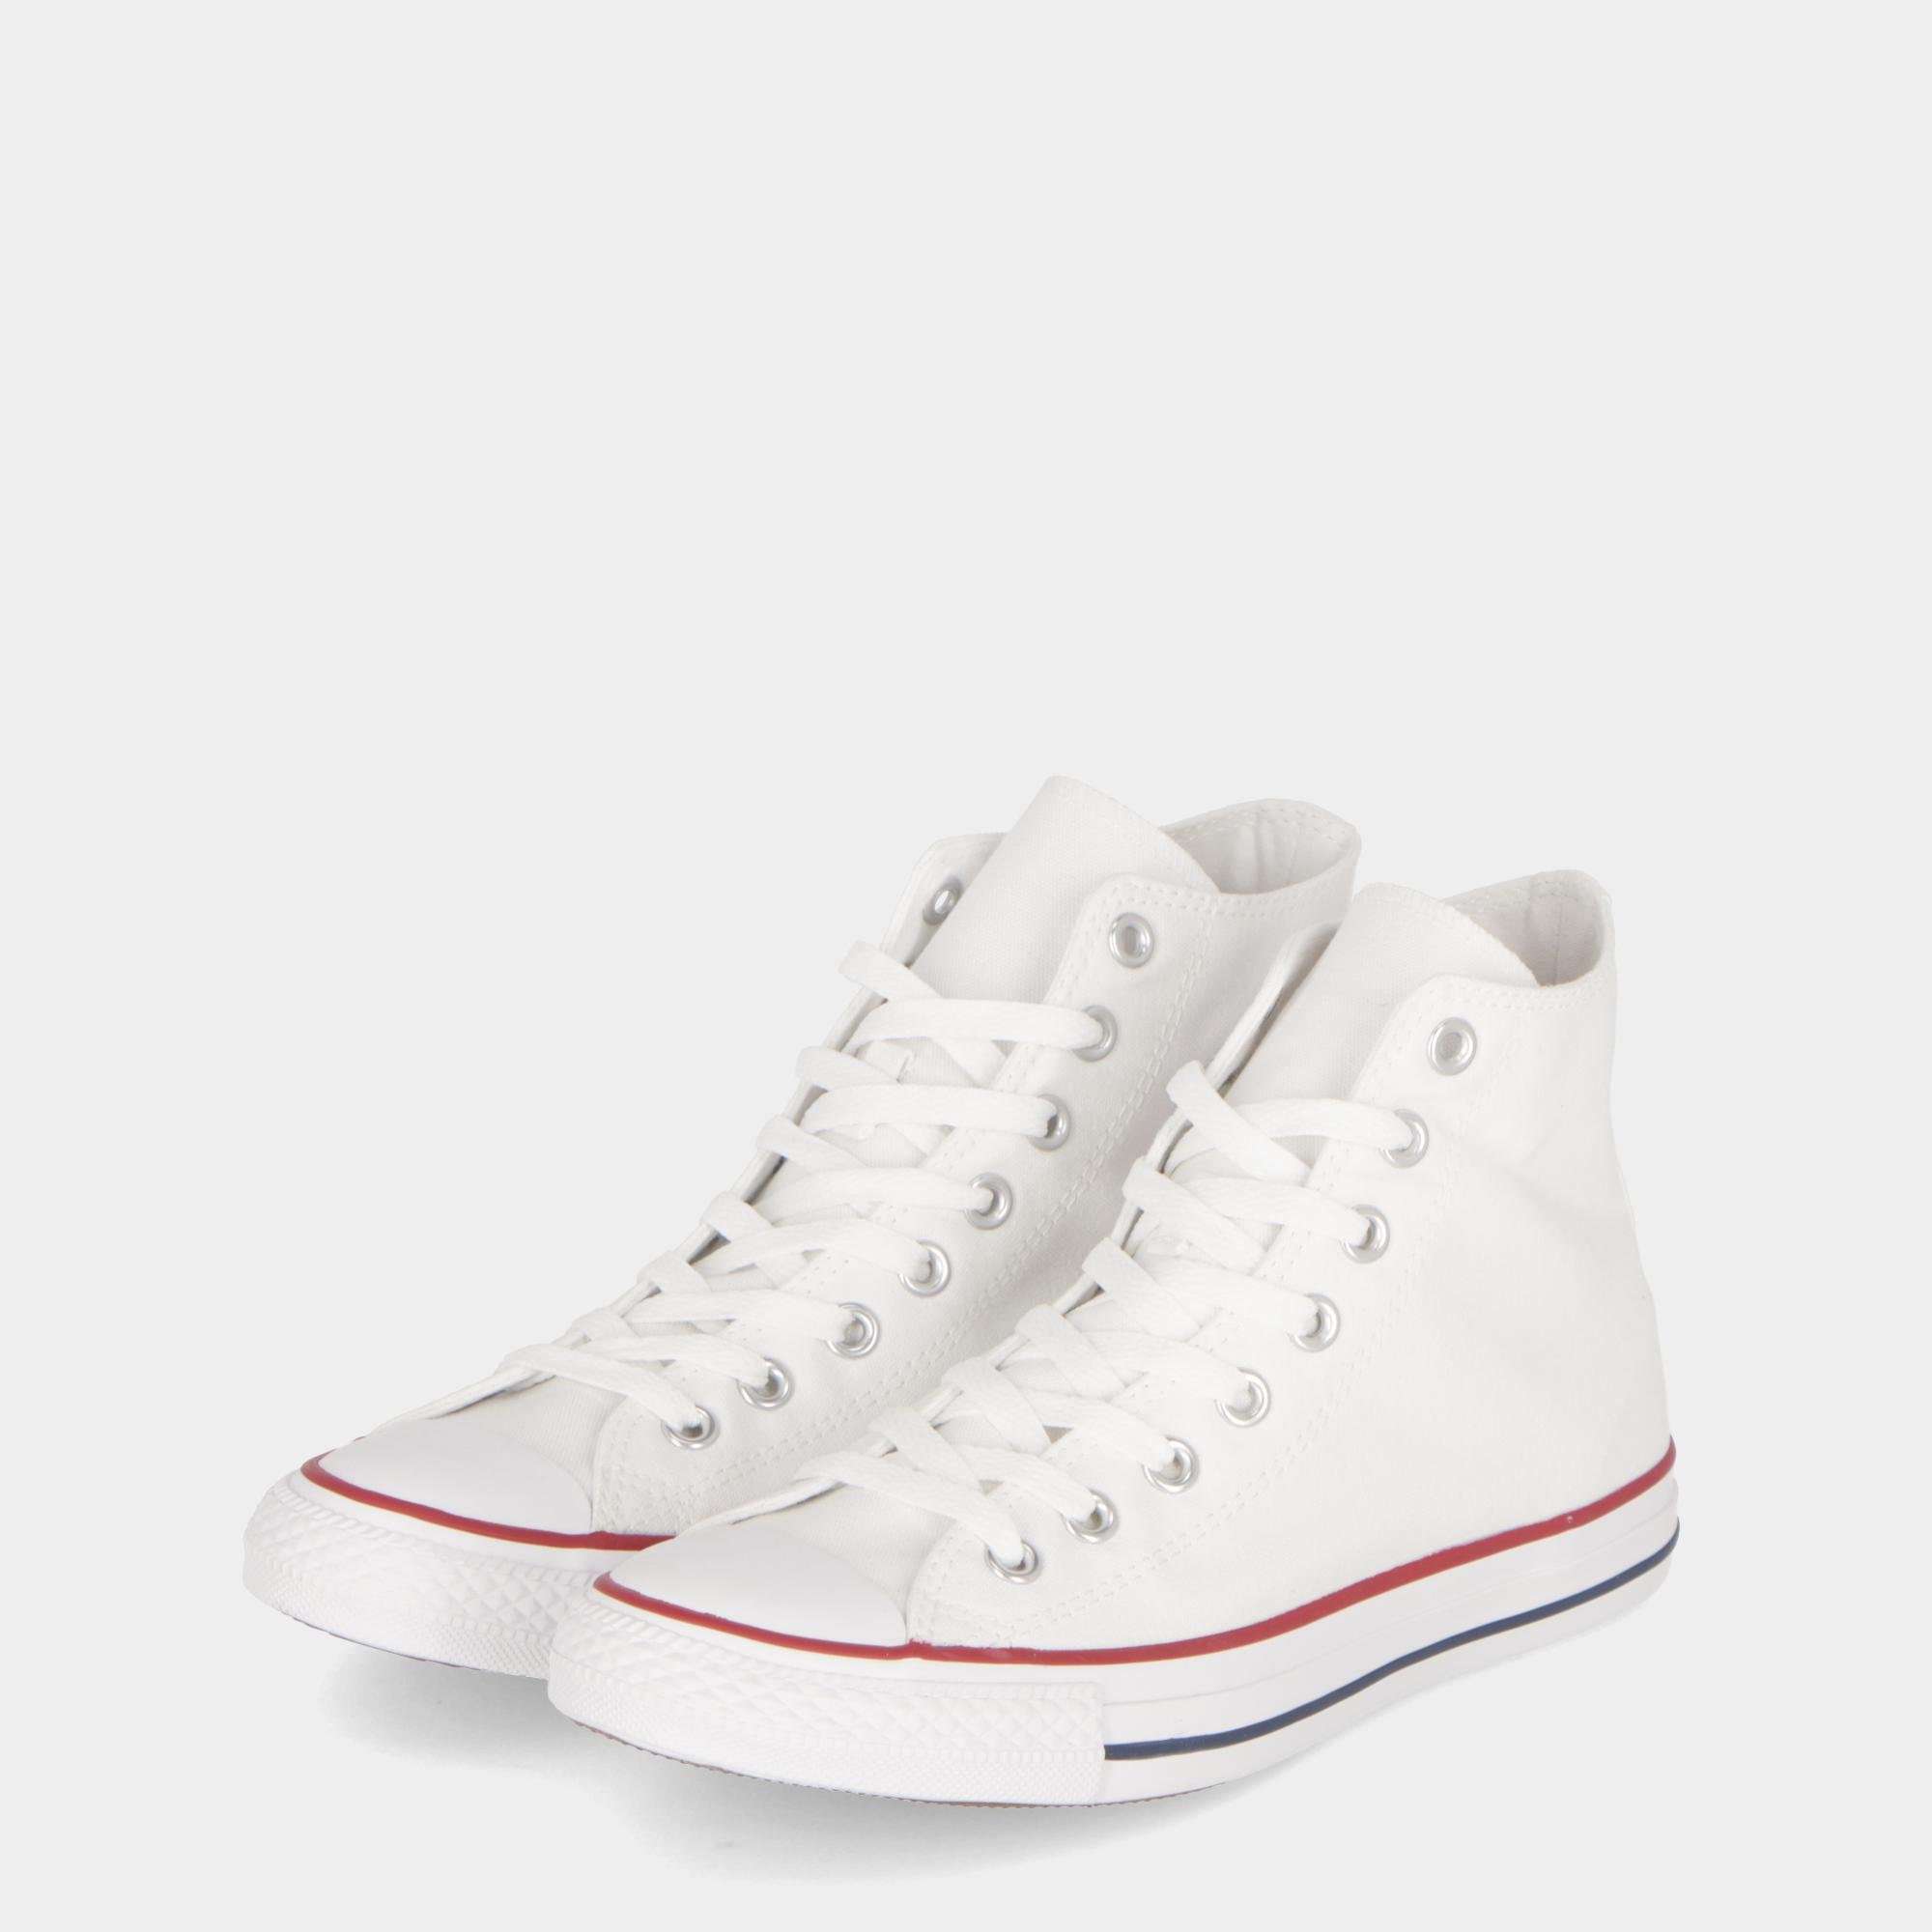 Converse Chuck Taylor All Star Hi Canvas OPTICAL WHITE